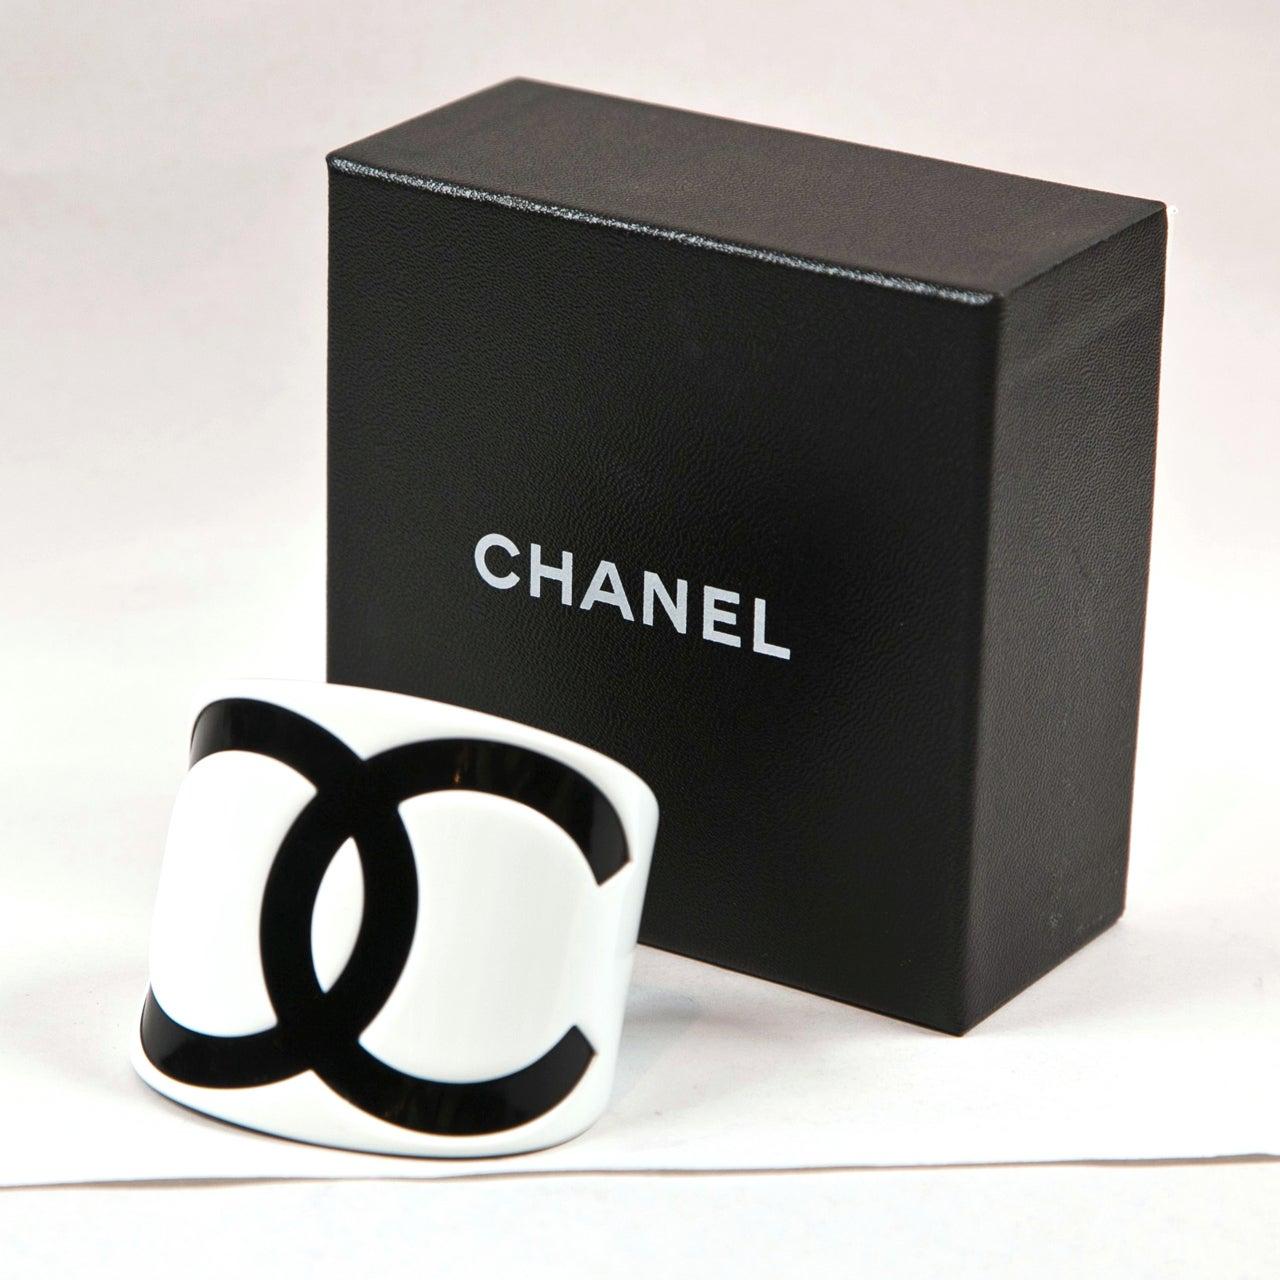 Chanel Resin Cuff image 2